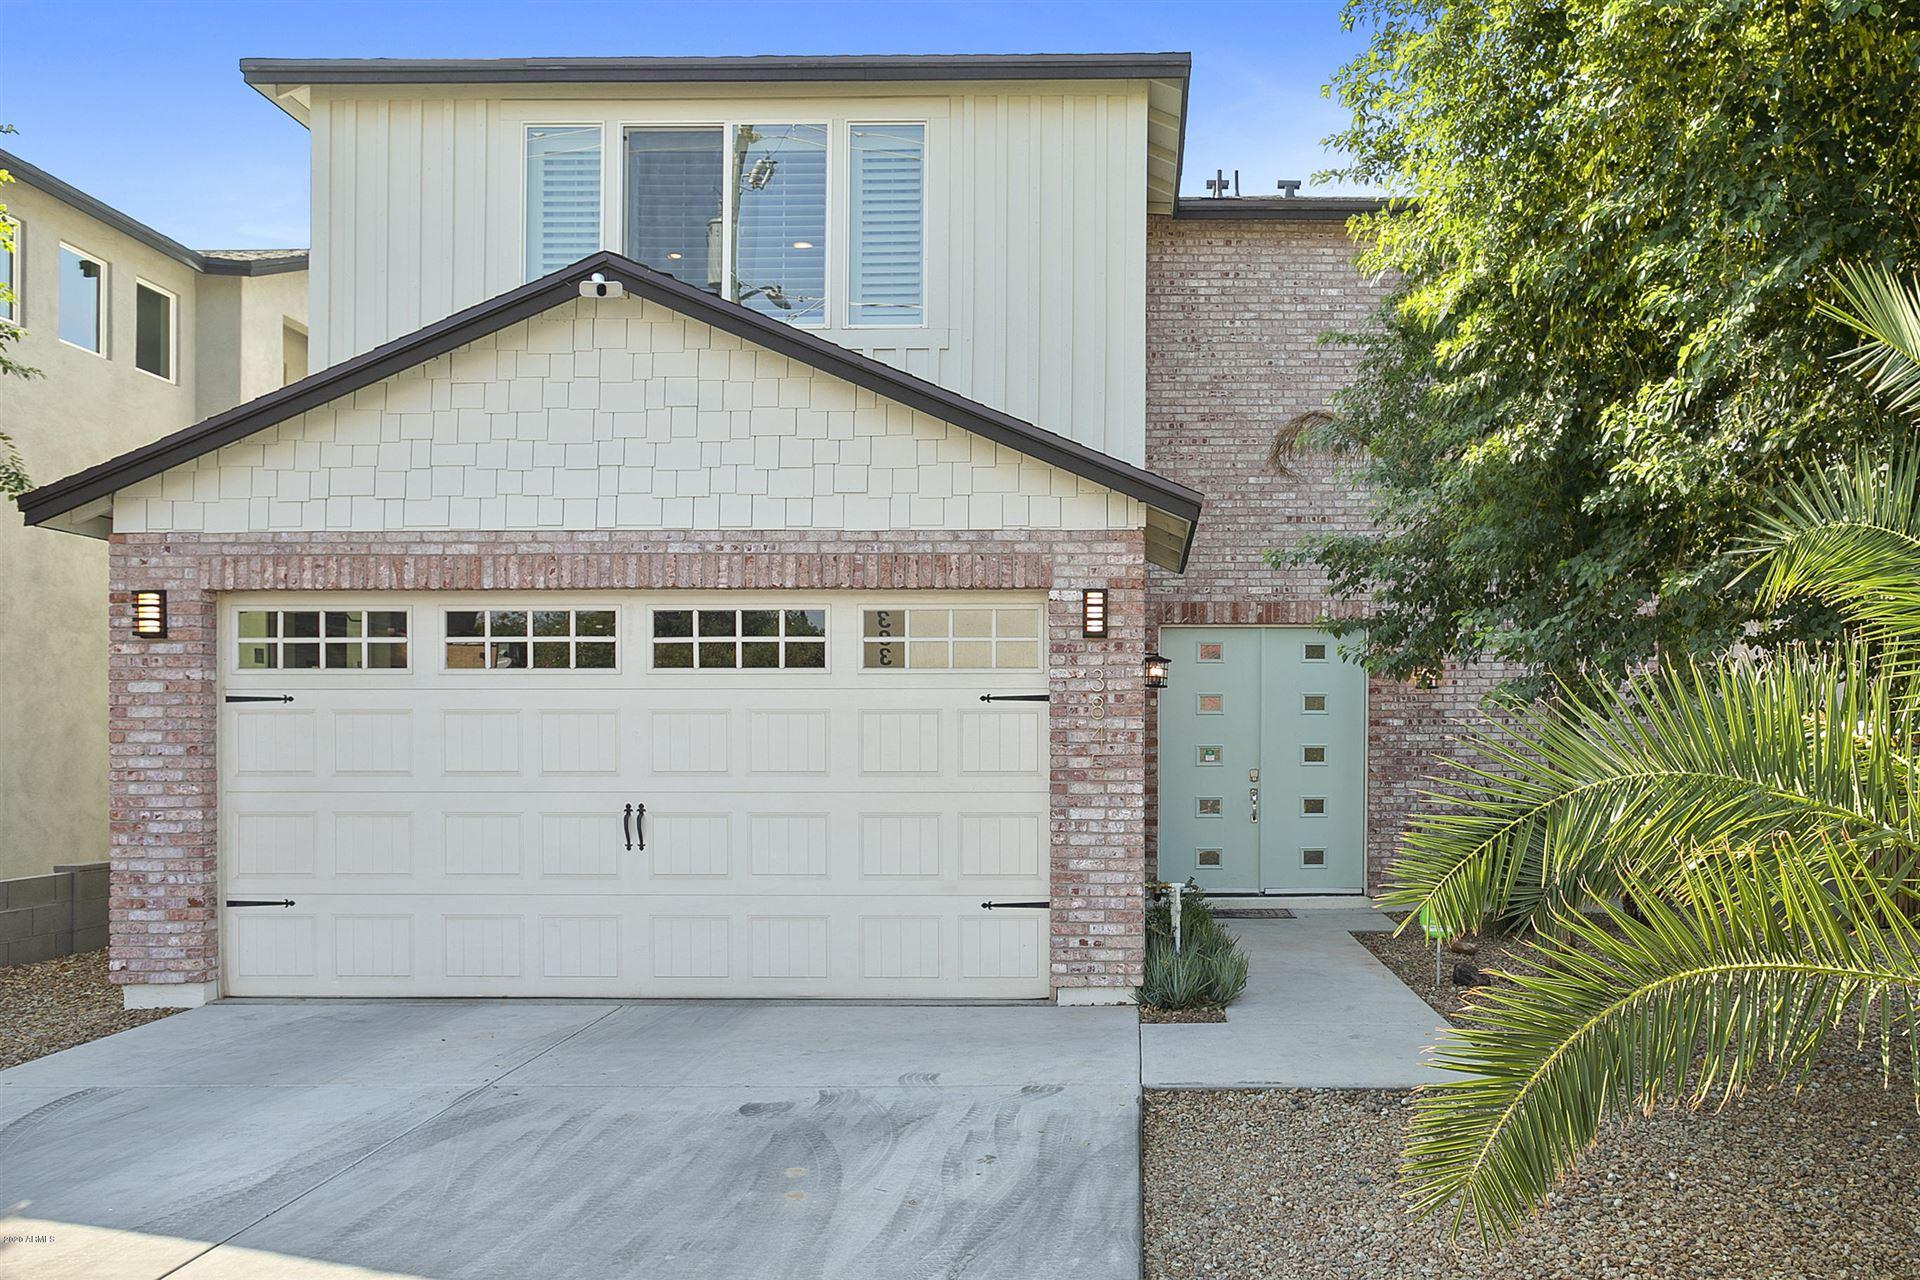 3845 E EARLL Drive, Phoenix, AZ 85018 - MLS#: 6148557